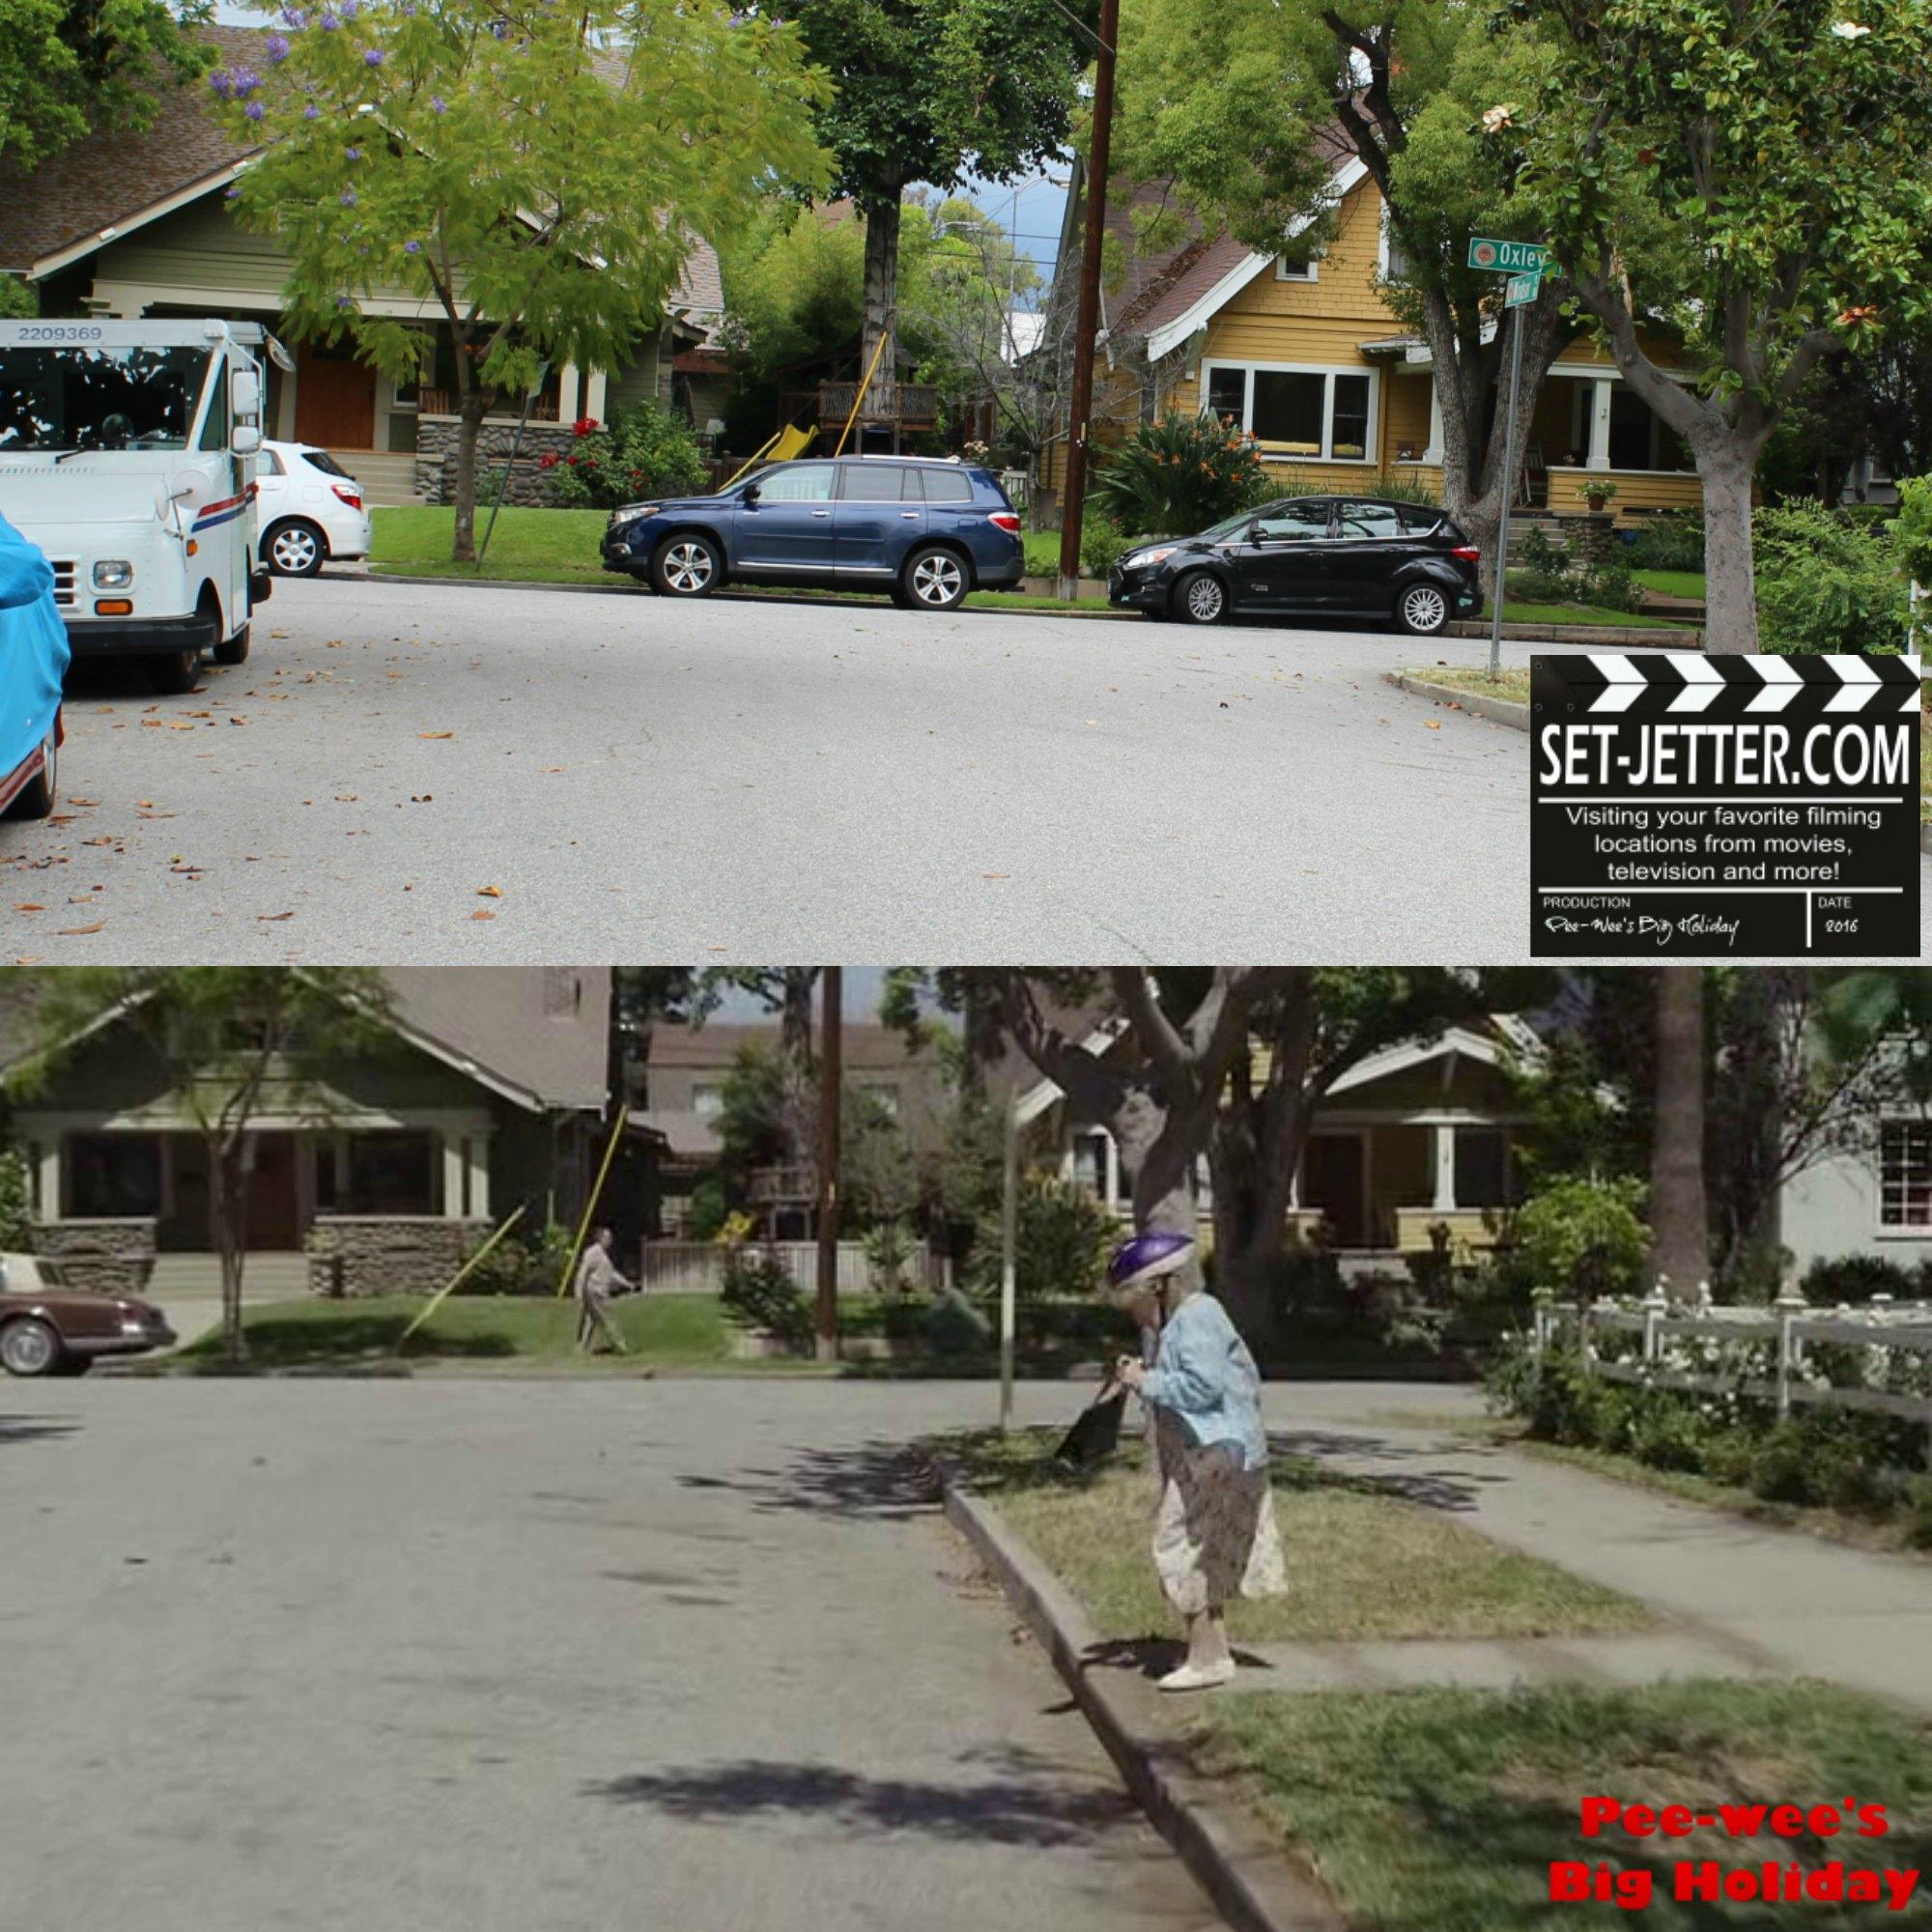 Pee Wee's Big Holiday comparison 224.jpg